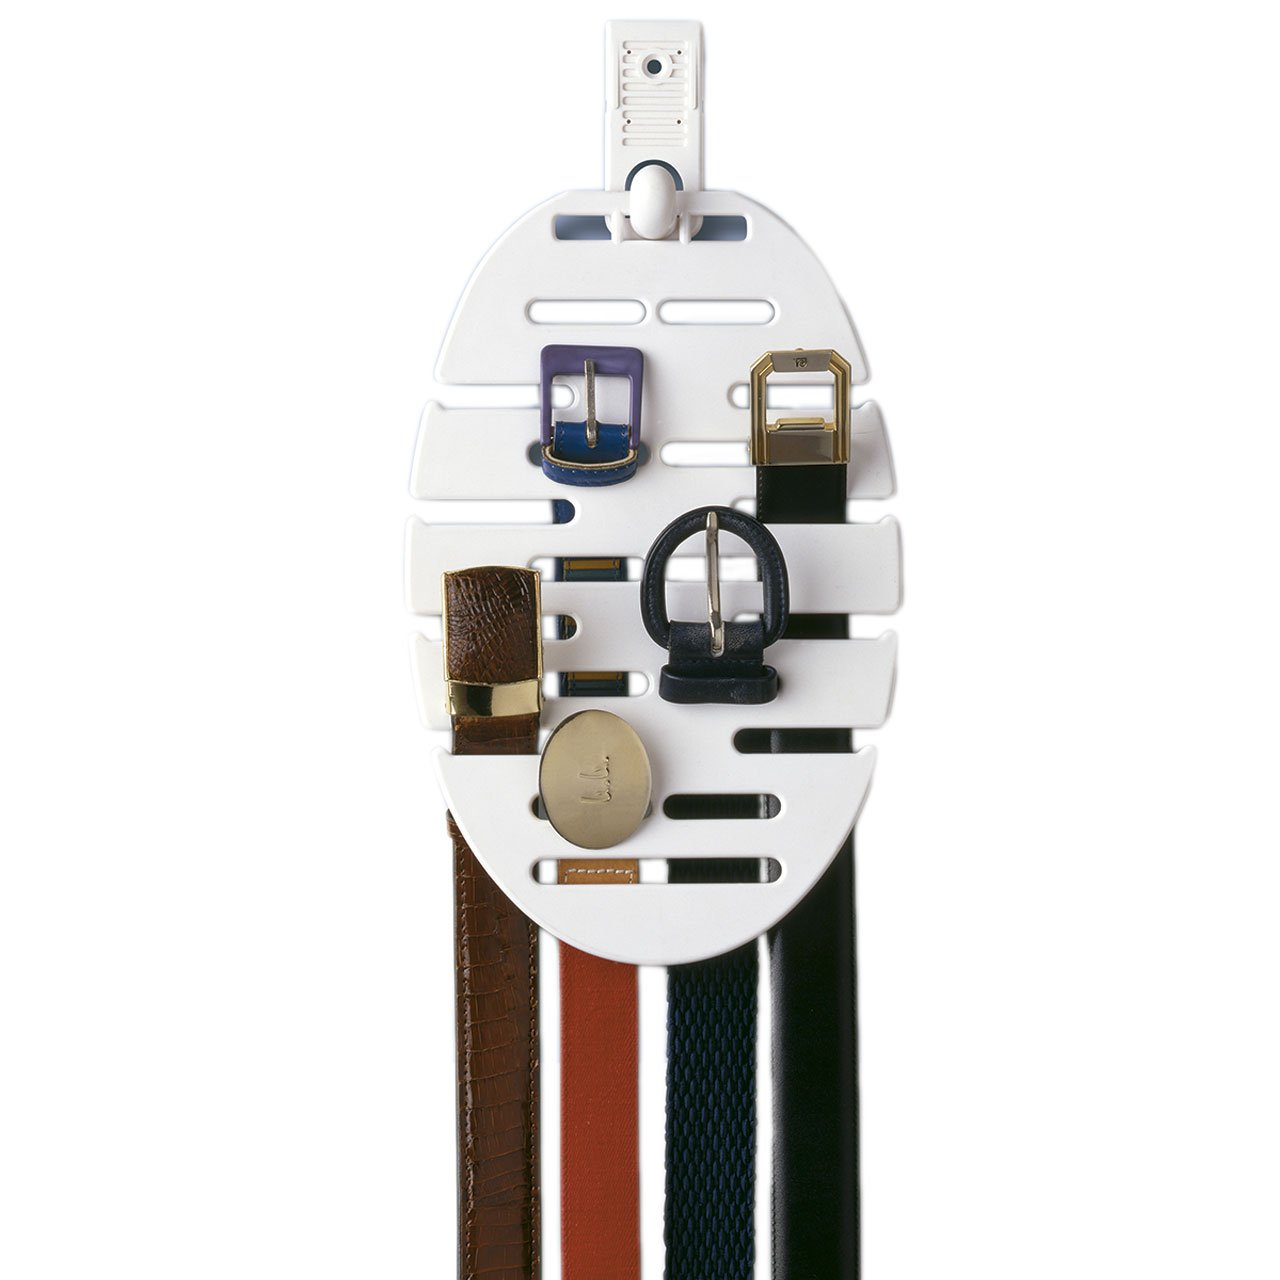 Rayen 2204 Belt Hanger with Self-Adhesive Bracket for 20 Belts